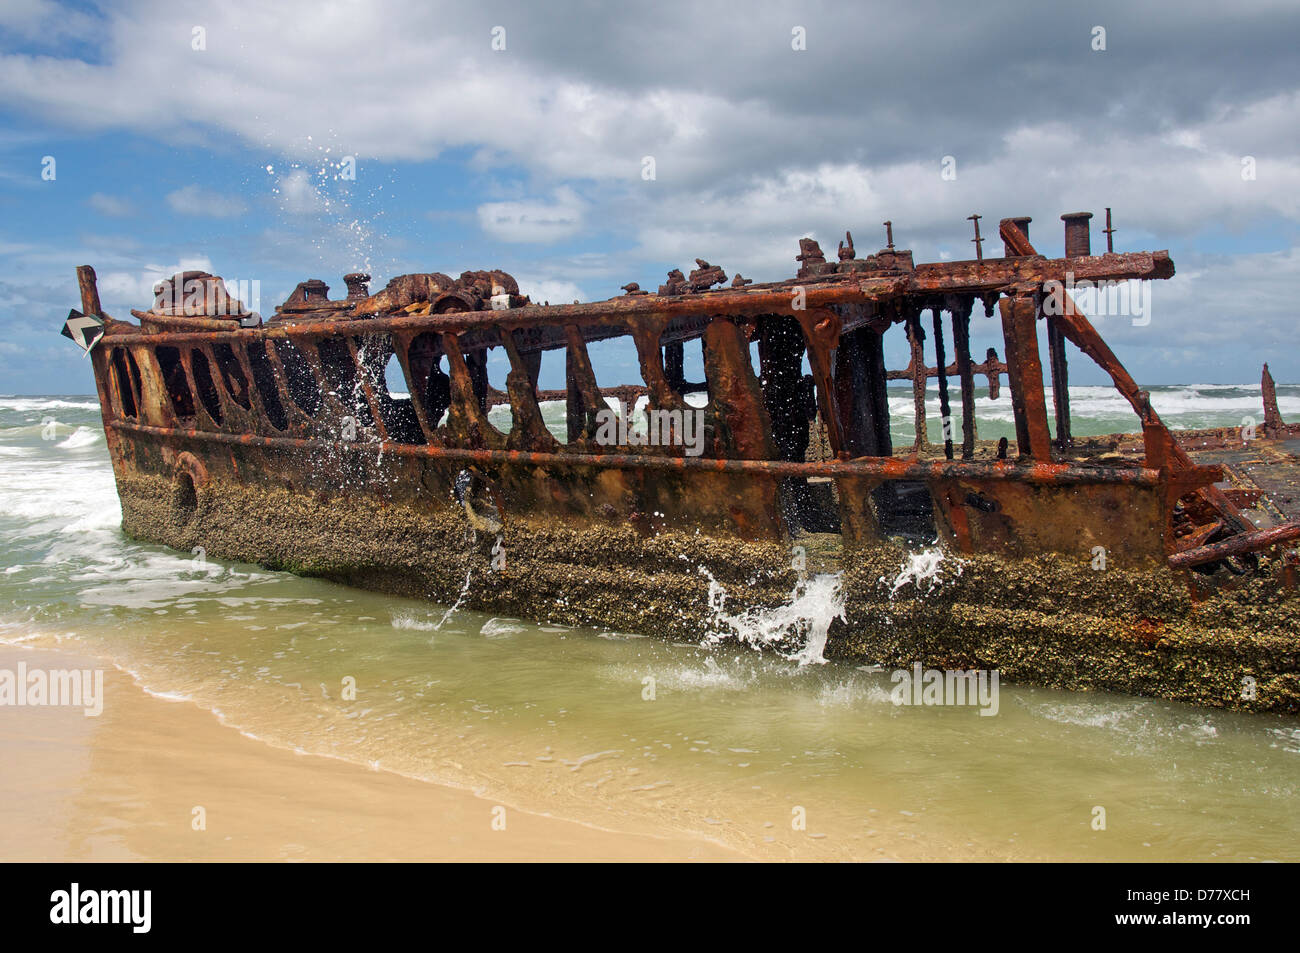 Maheno shipwreck Seventy Five Mile Beach Fraser Island Queensland Australia - Stock Image